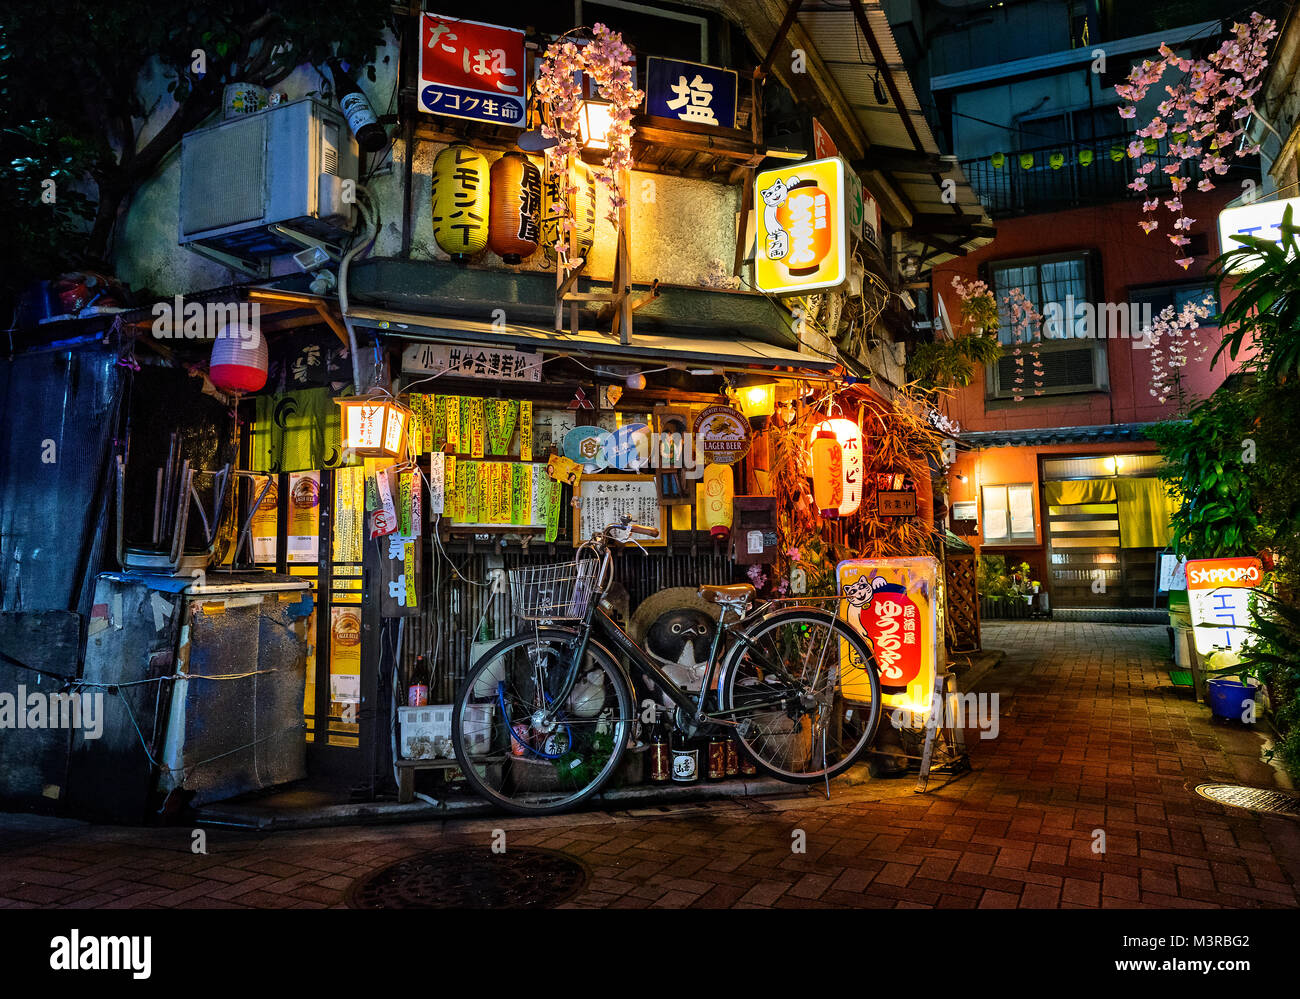 Japan, Honshu island, Kanto, Tokyo, picturesque back alley. - Stock Image